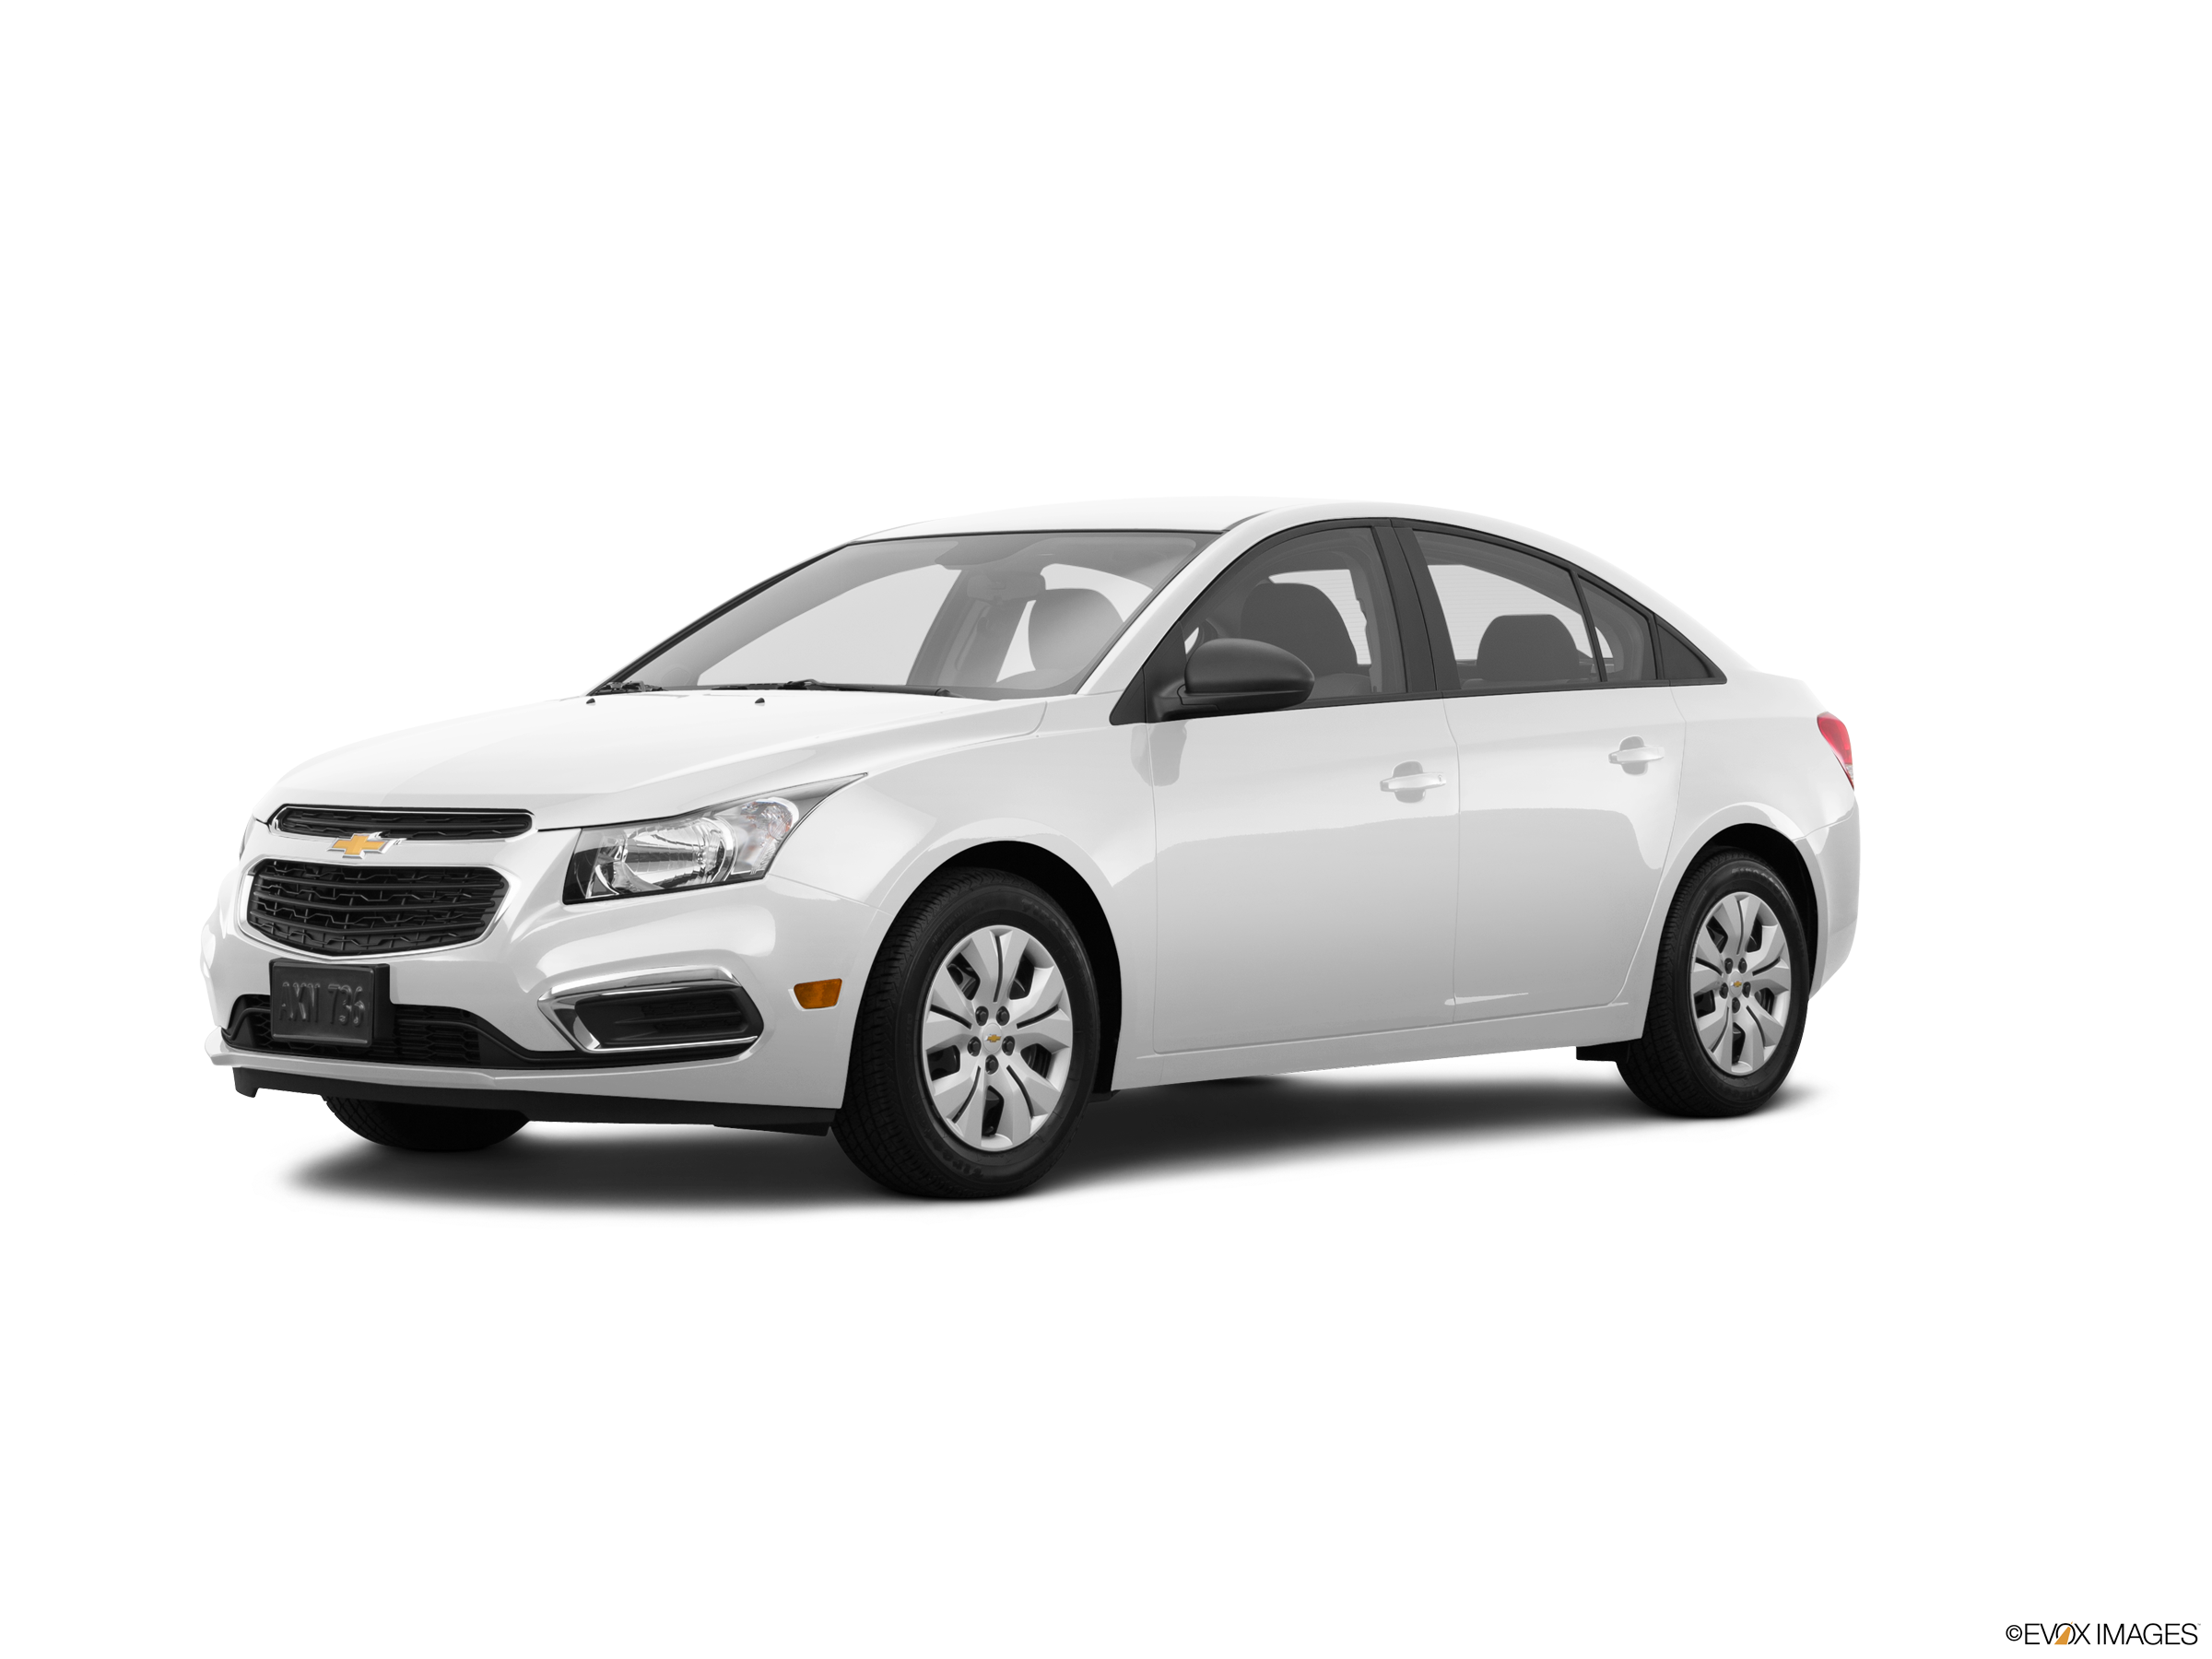 Kelebihan Cruze Chevrolet Murah Berkualitas